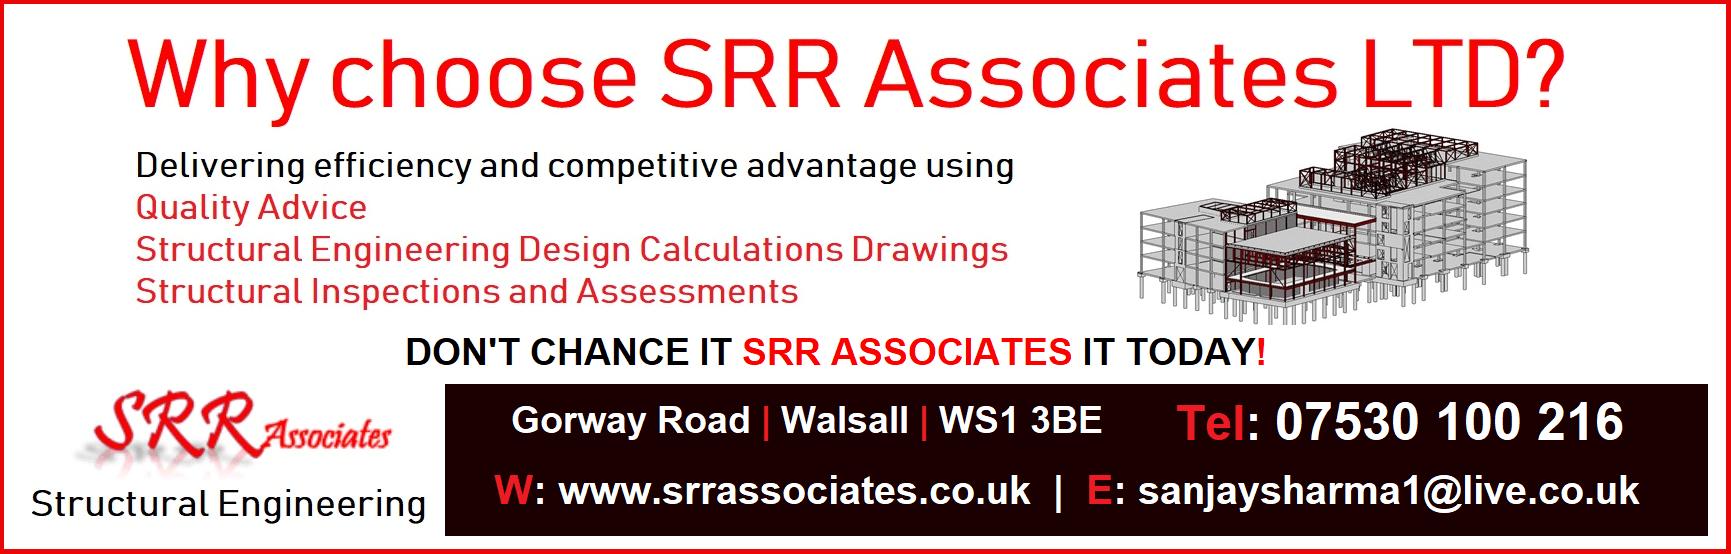 SRR Associates Ltd